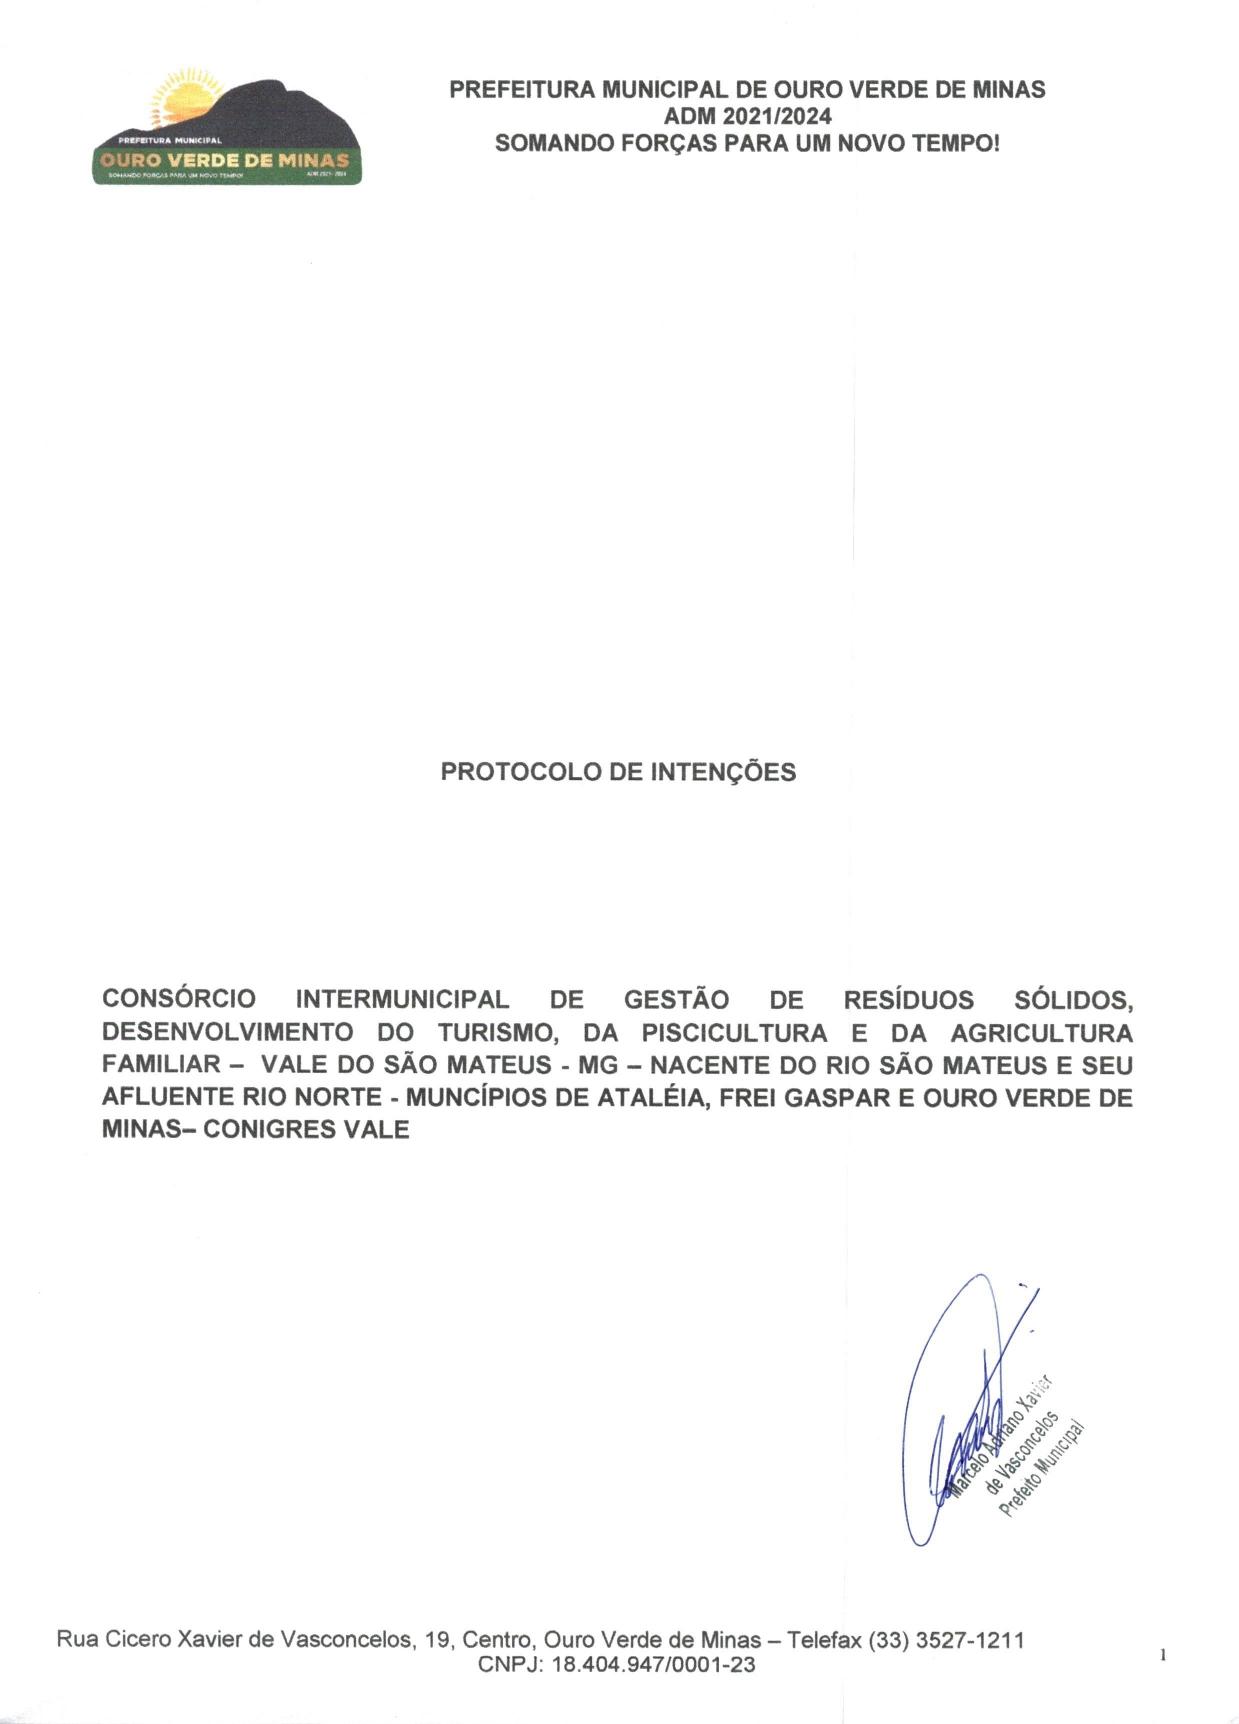 PROTOCOLO DE INTENÇÕES, CONIGRES-VALE